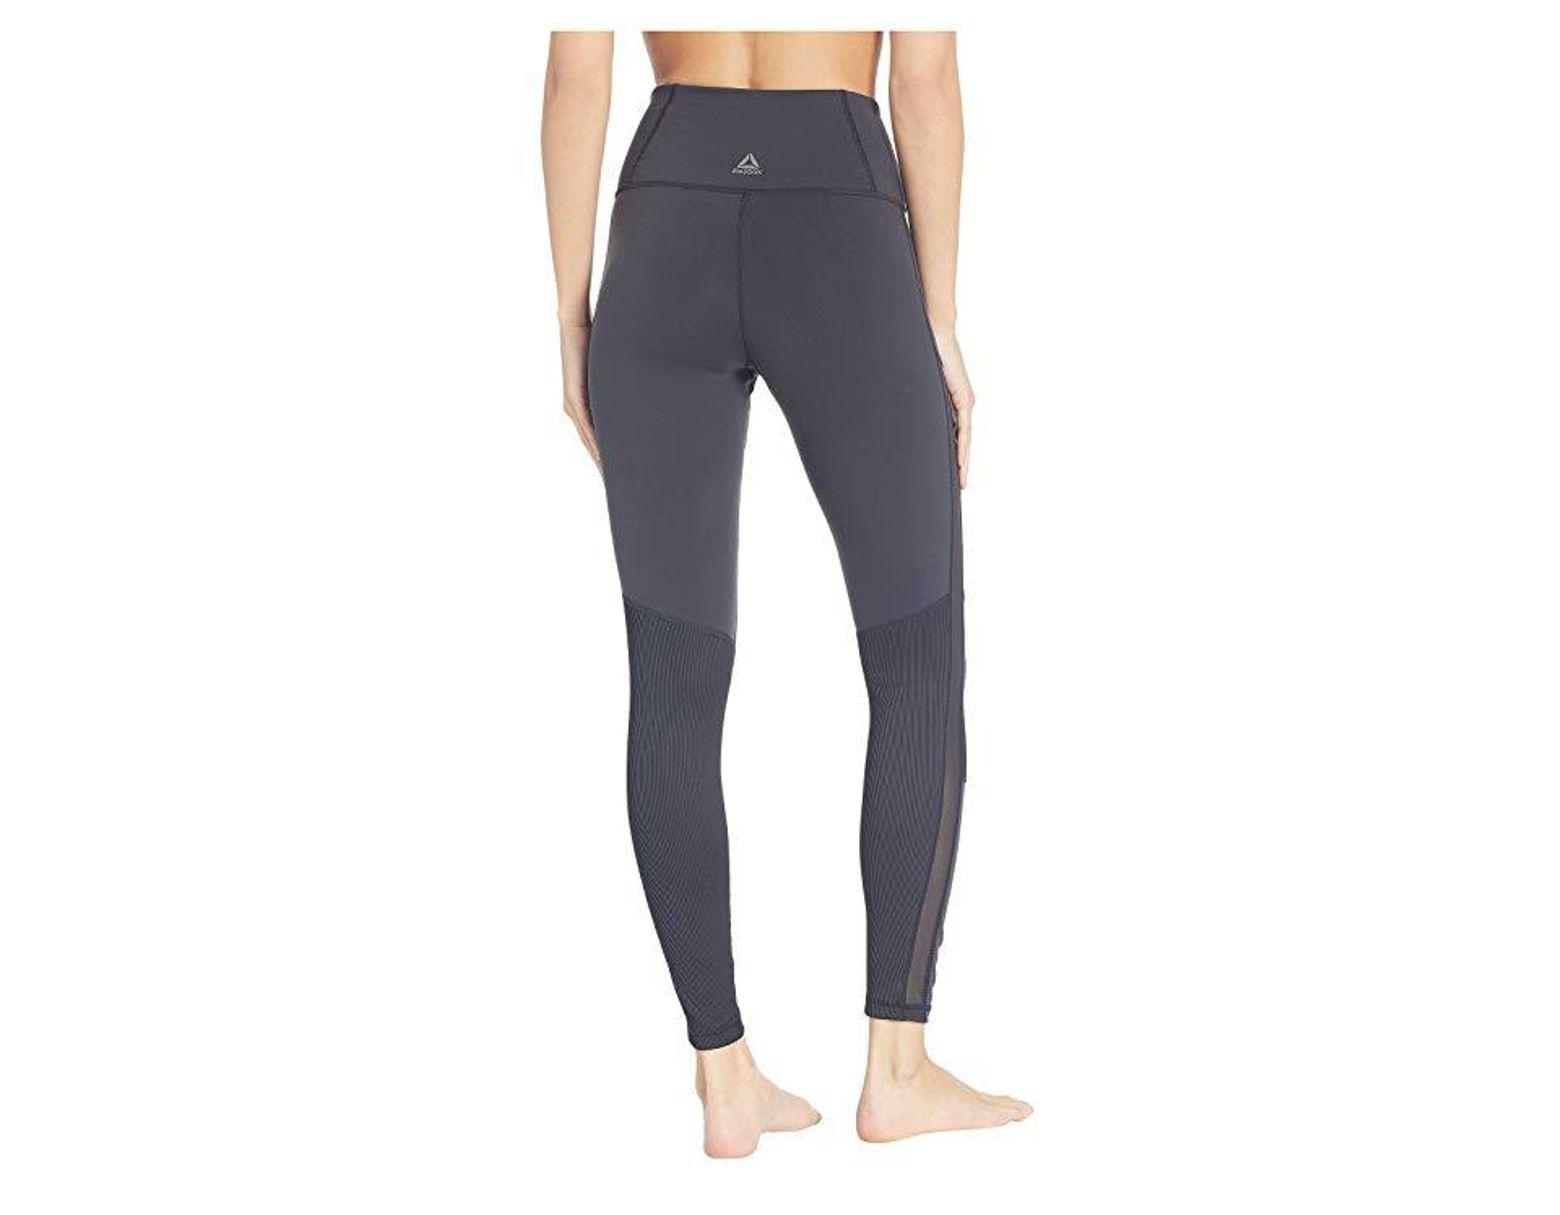 f4f9941c Reebok Lux Ribbed High-rise Tights-rib (black) Casual Pants in Black - Lyst